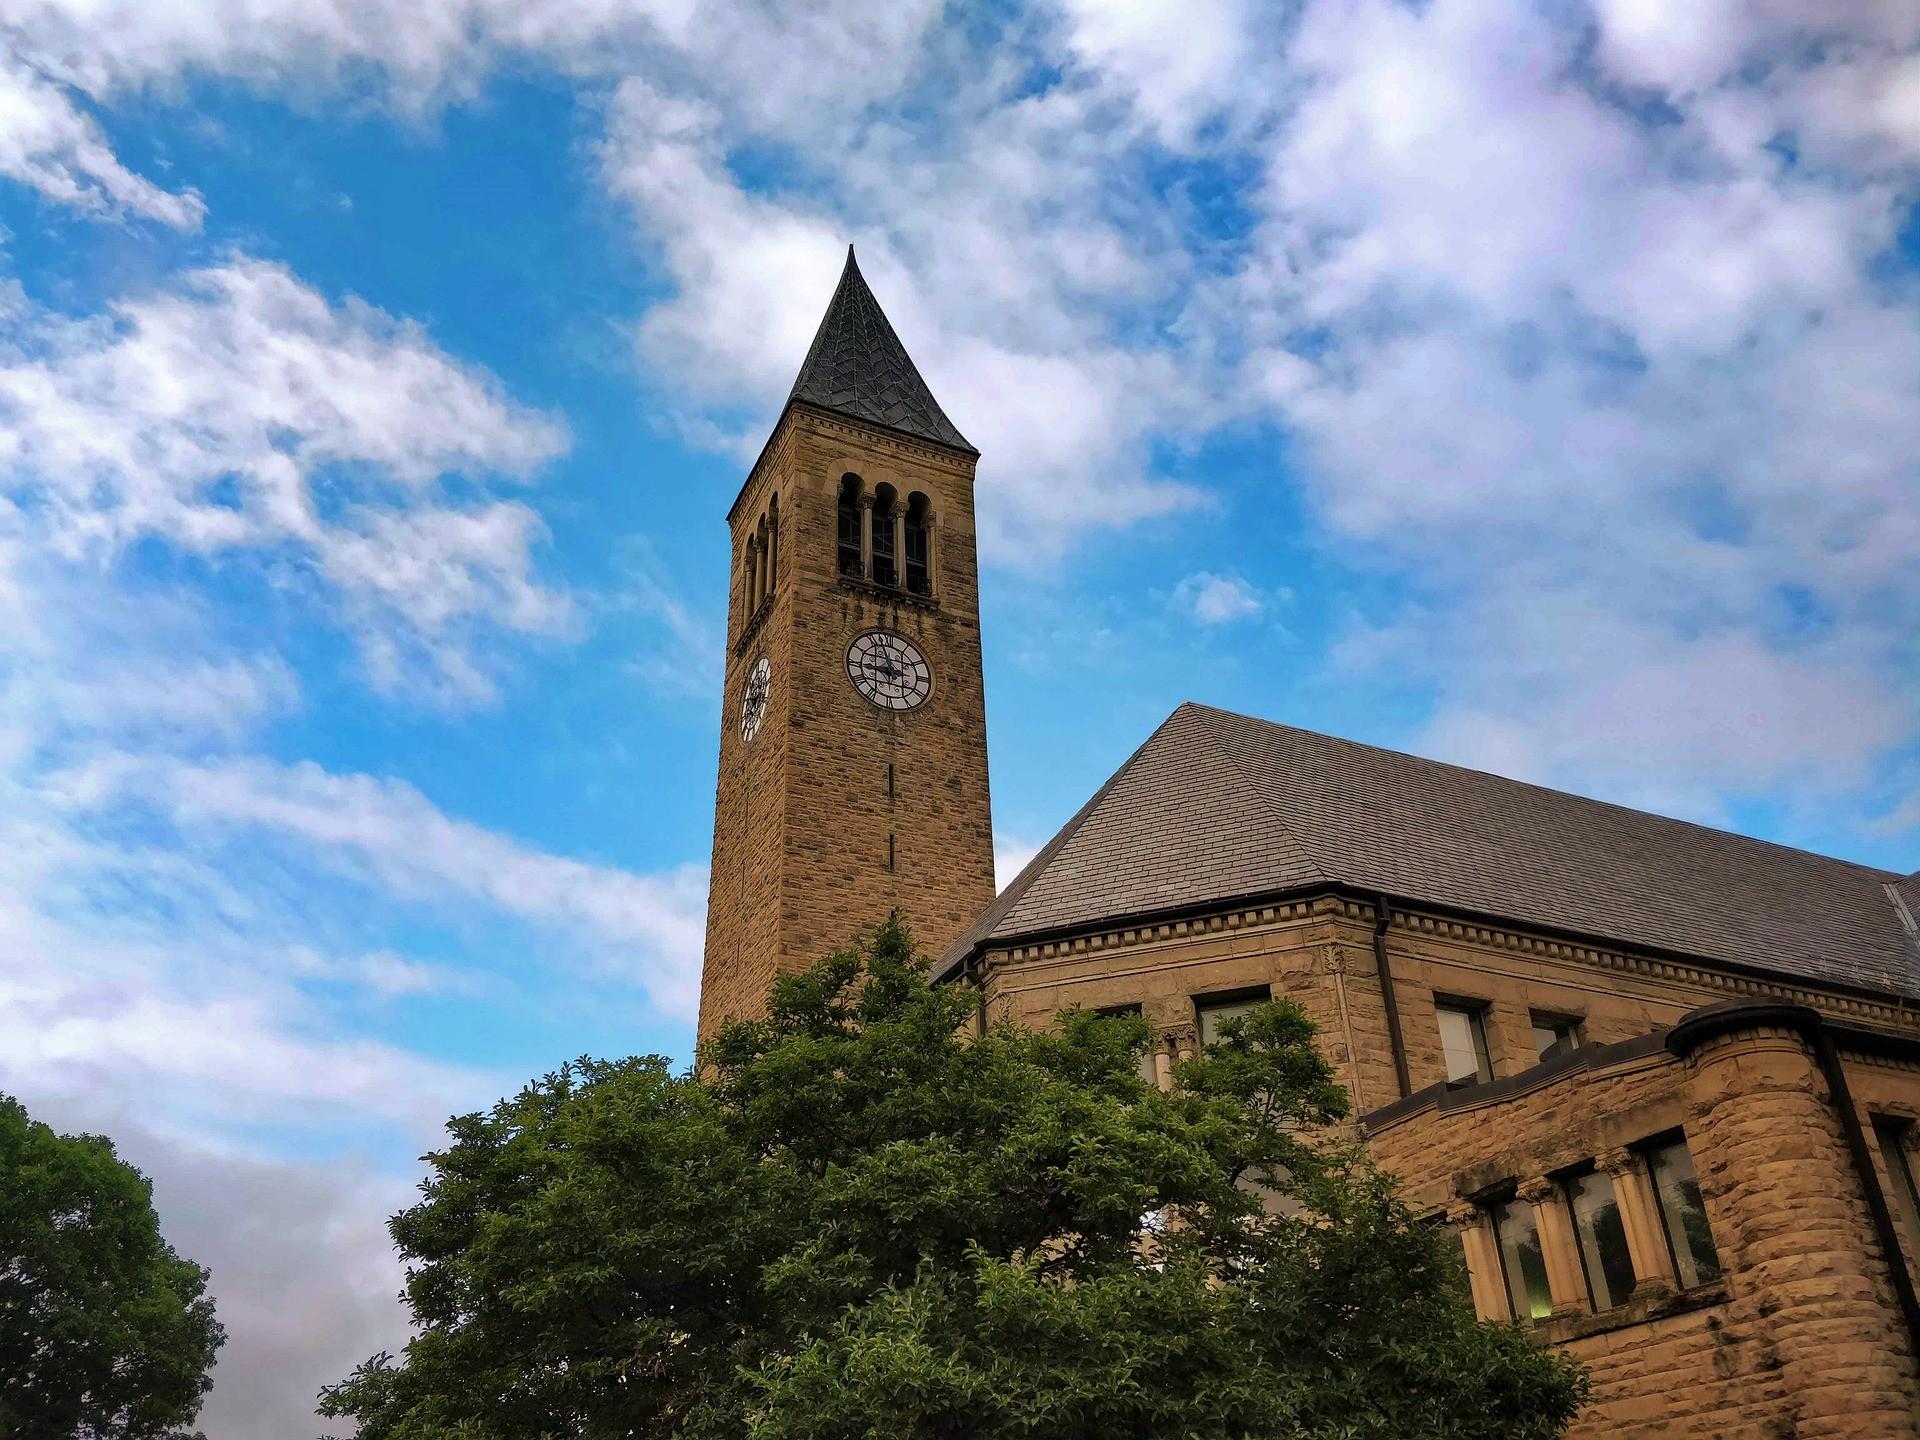 cornell-university-ithaca-new-york-call-put-strike-financial-news